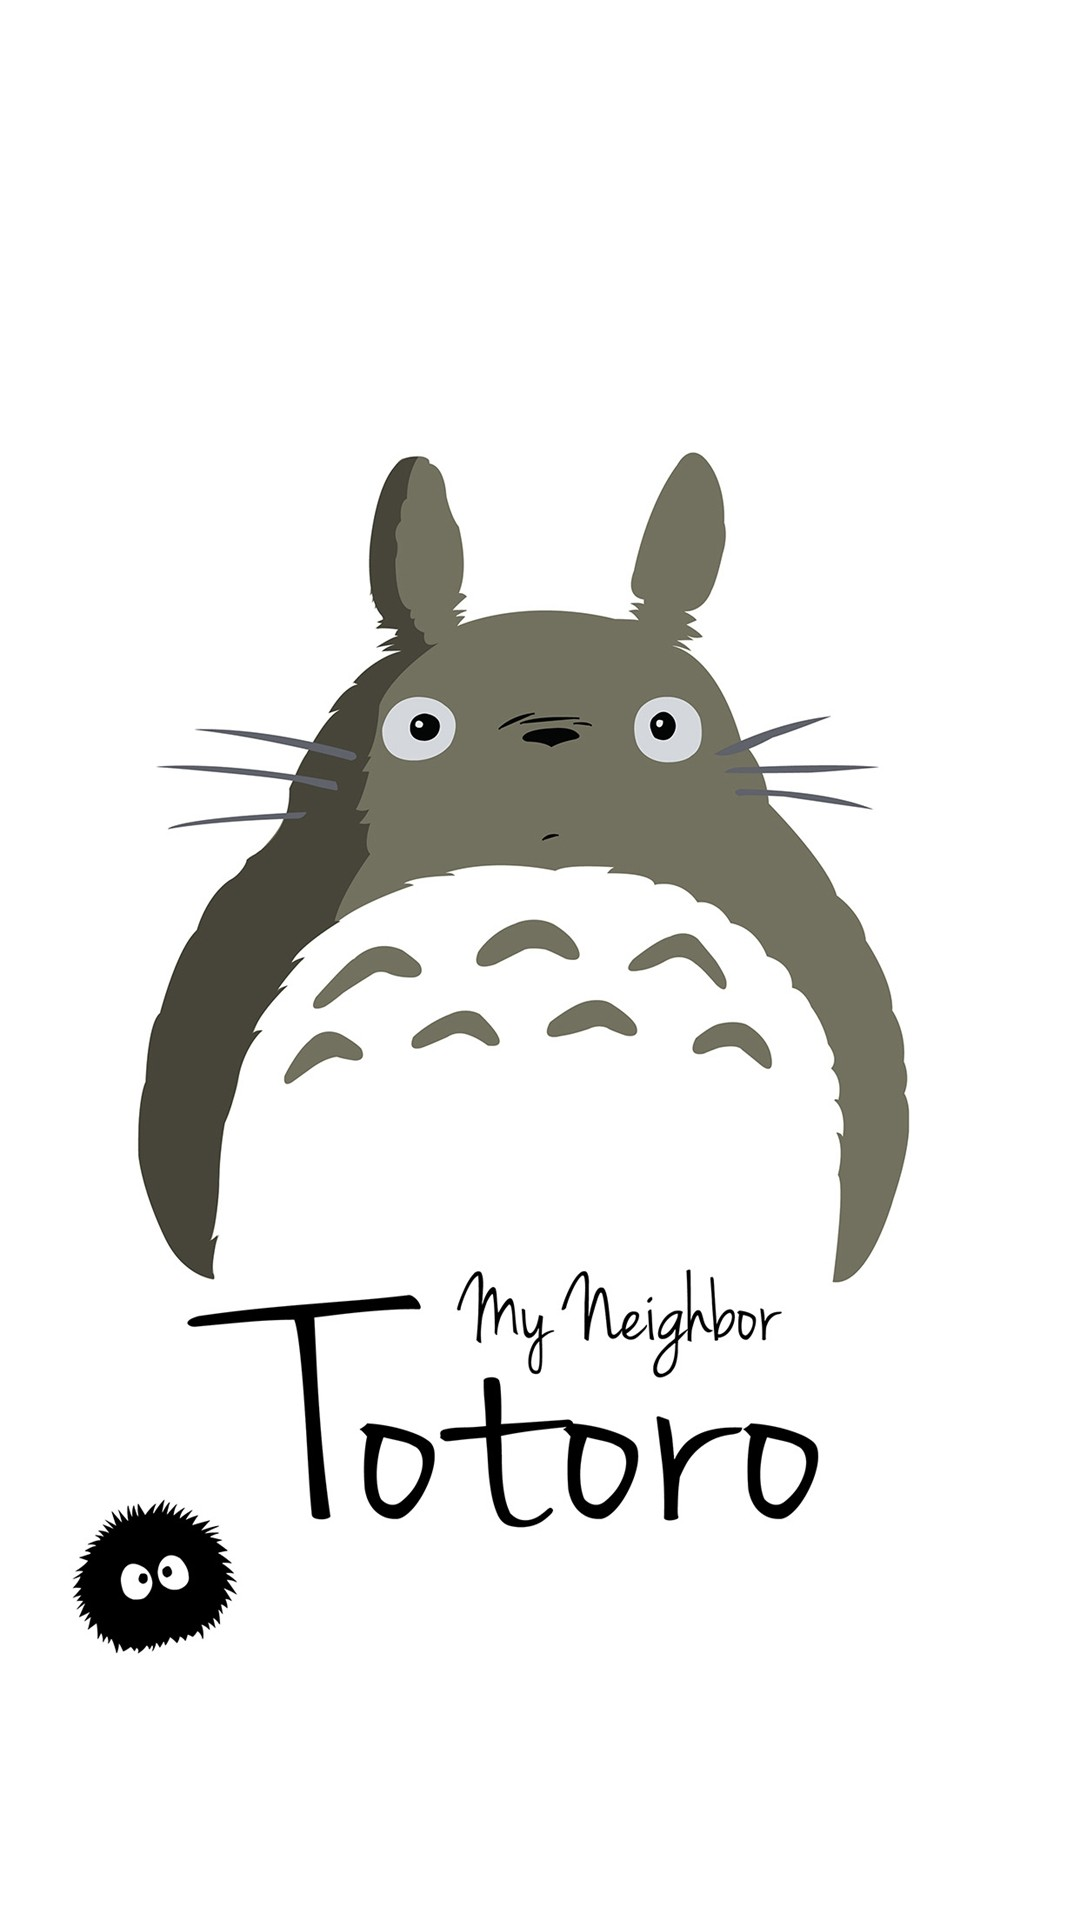 Permalink to My Neighbor Totoro Full Movie